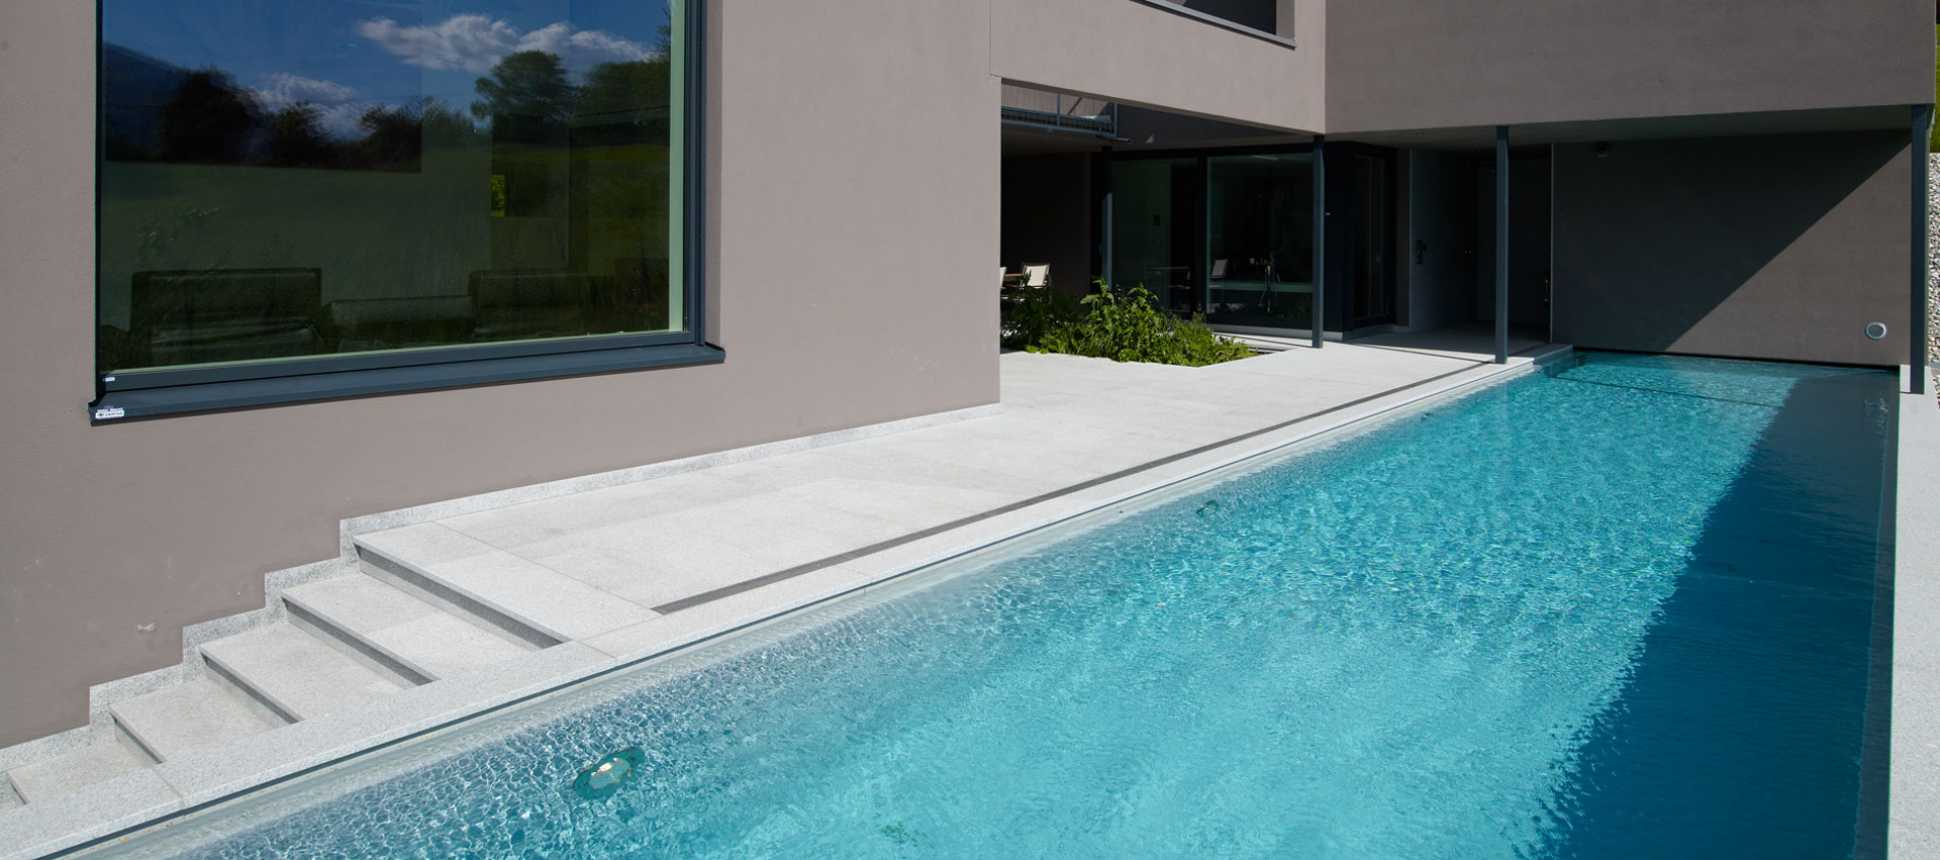 schwimmbadbau schwimmbadtechnik pool bauen ac schwimmbadtechnik. Black Bedroom Furniture Sets. Home Design Ideas